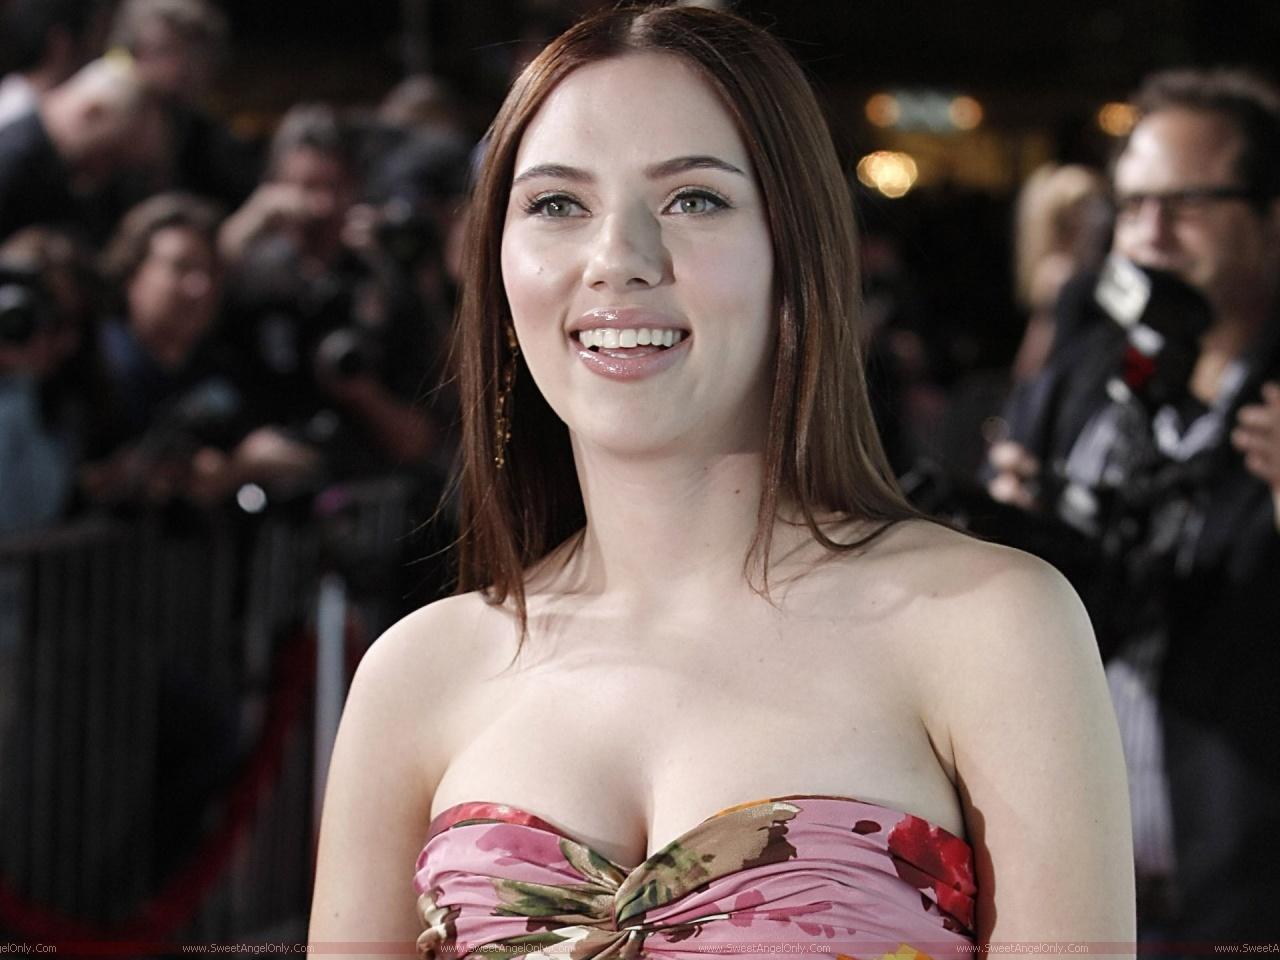 http://4.bp.blogspot.com/-HdtA9PqiO6w/Th5HB4jP2XI/AAAAAAAADOw/RH33x9fHmQA/s1600/Scarlett+Johansson+HD+Wallpapers.jpg